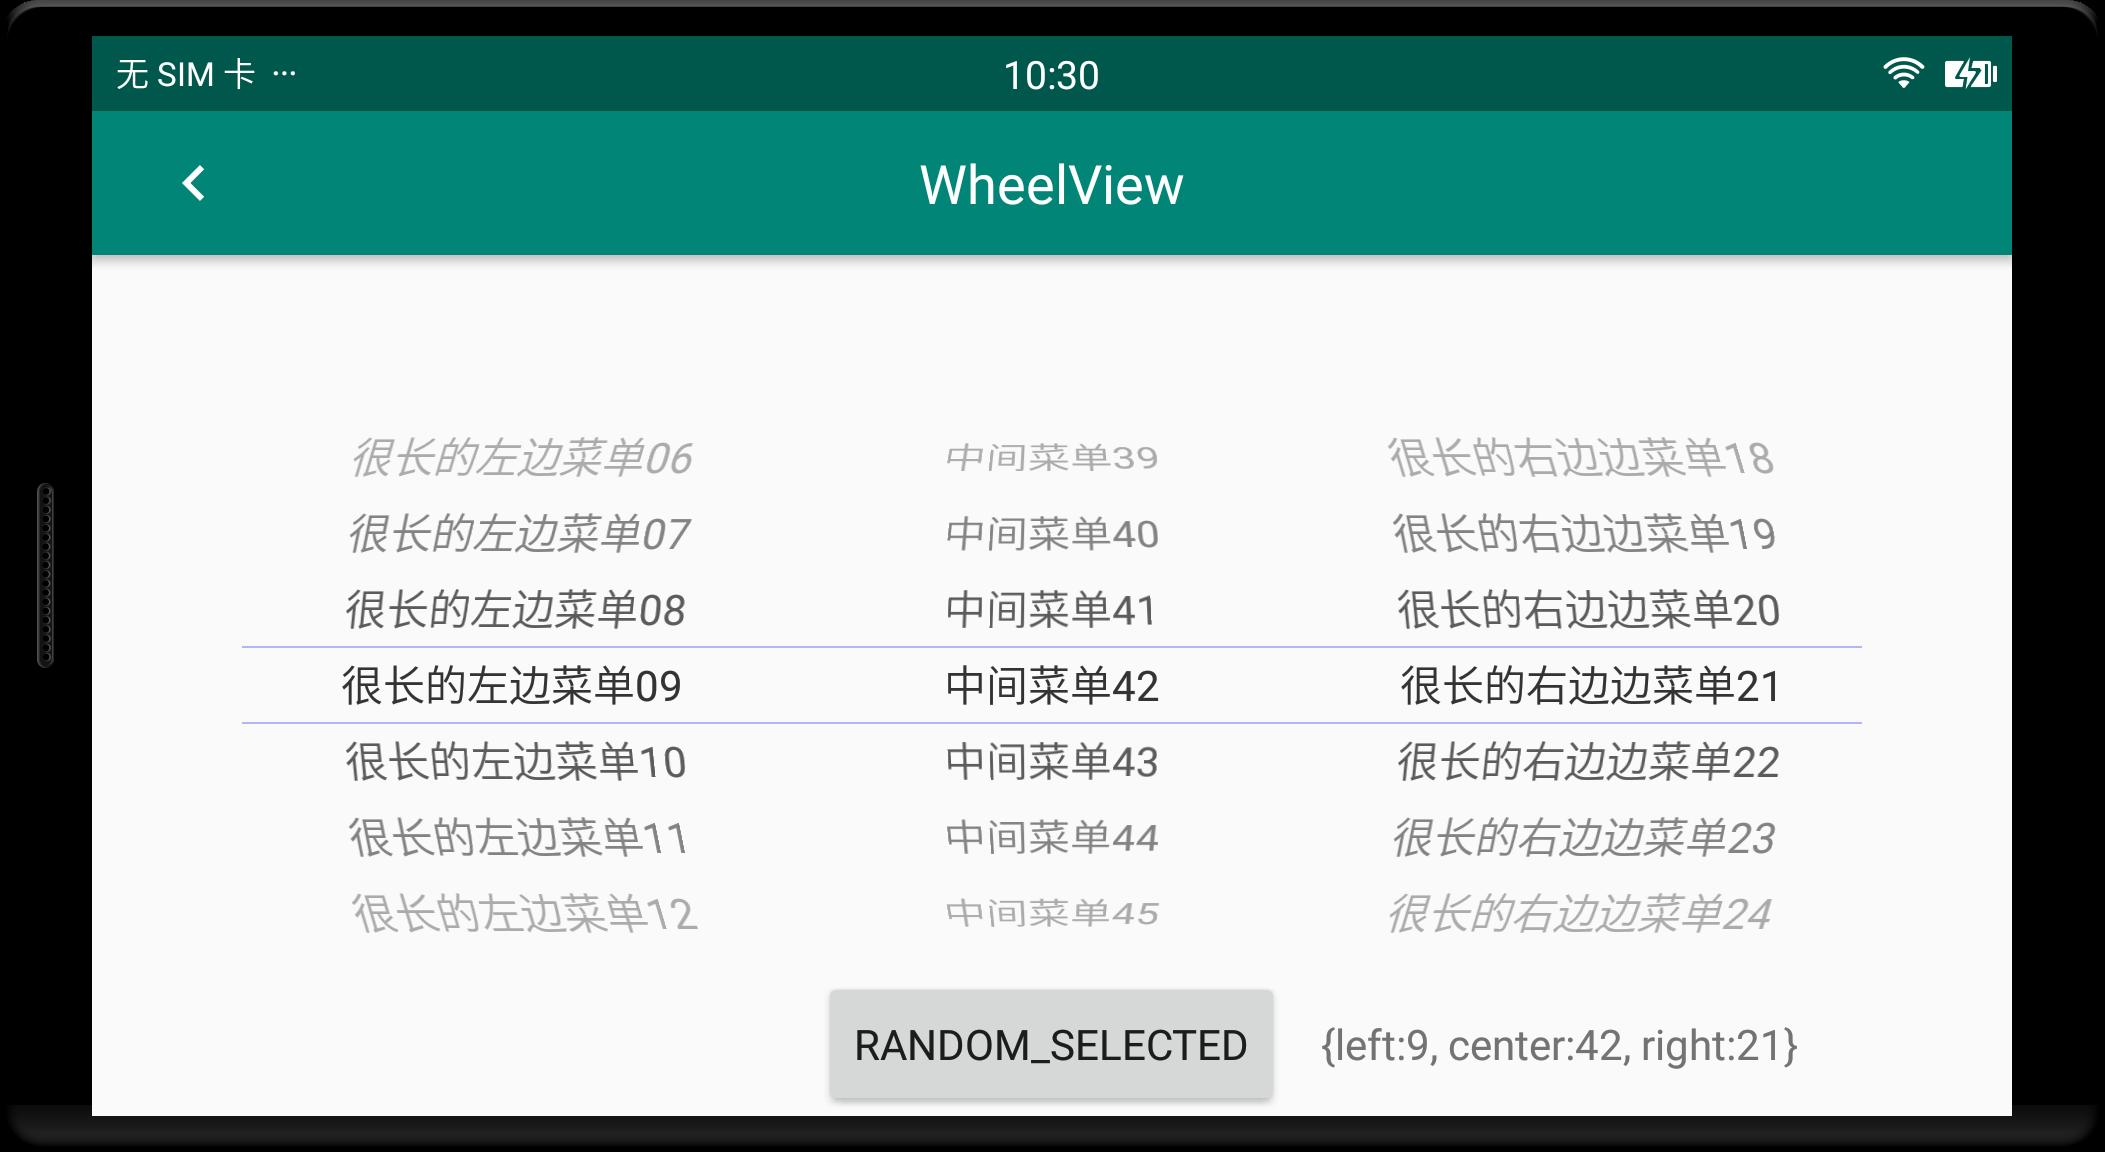 WheelView